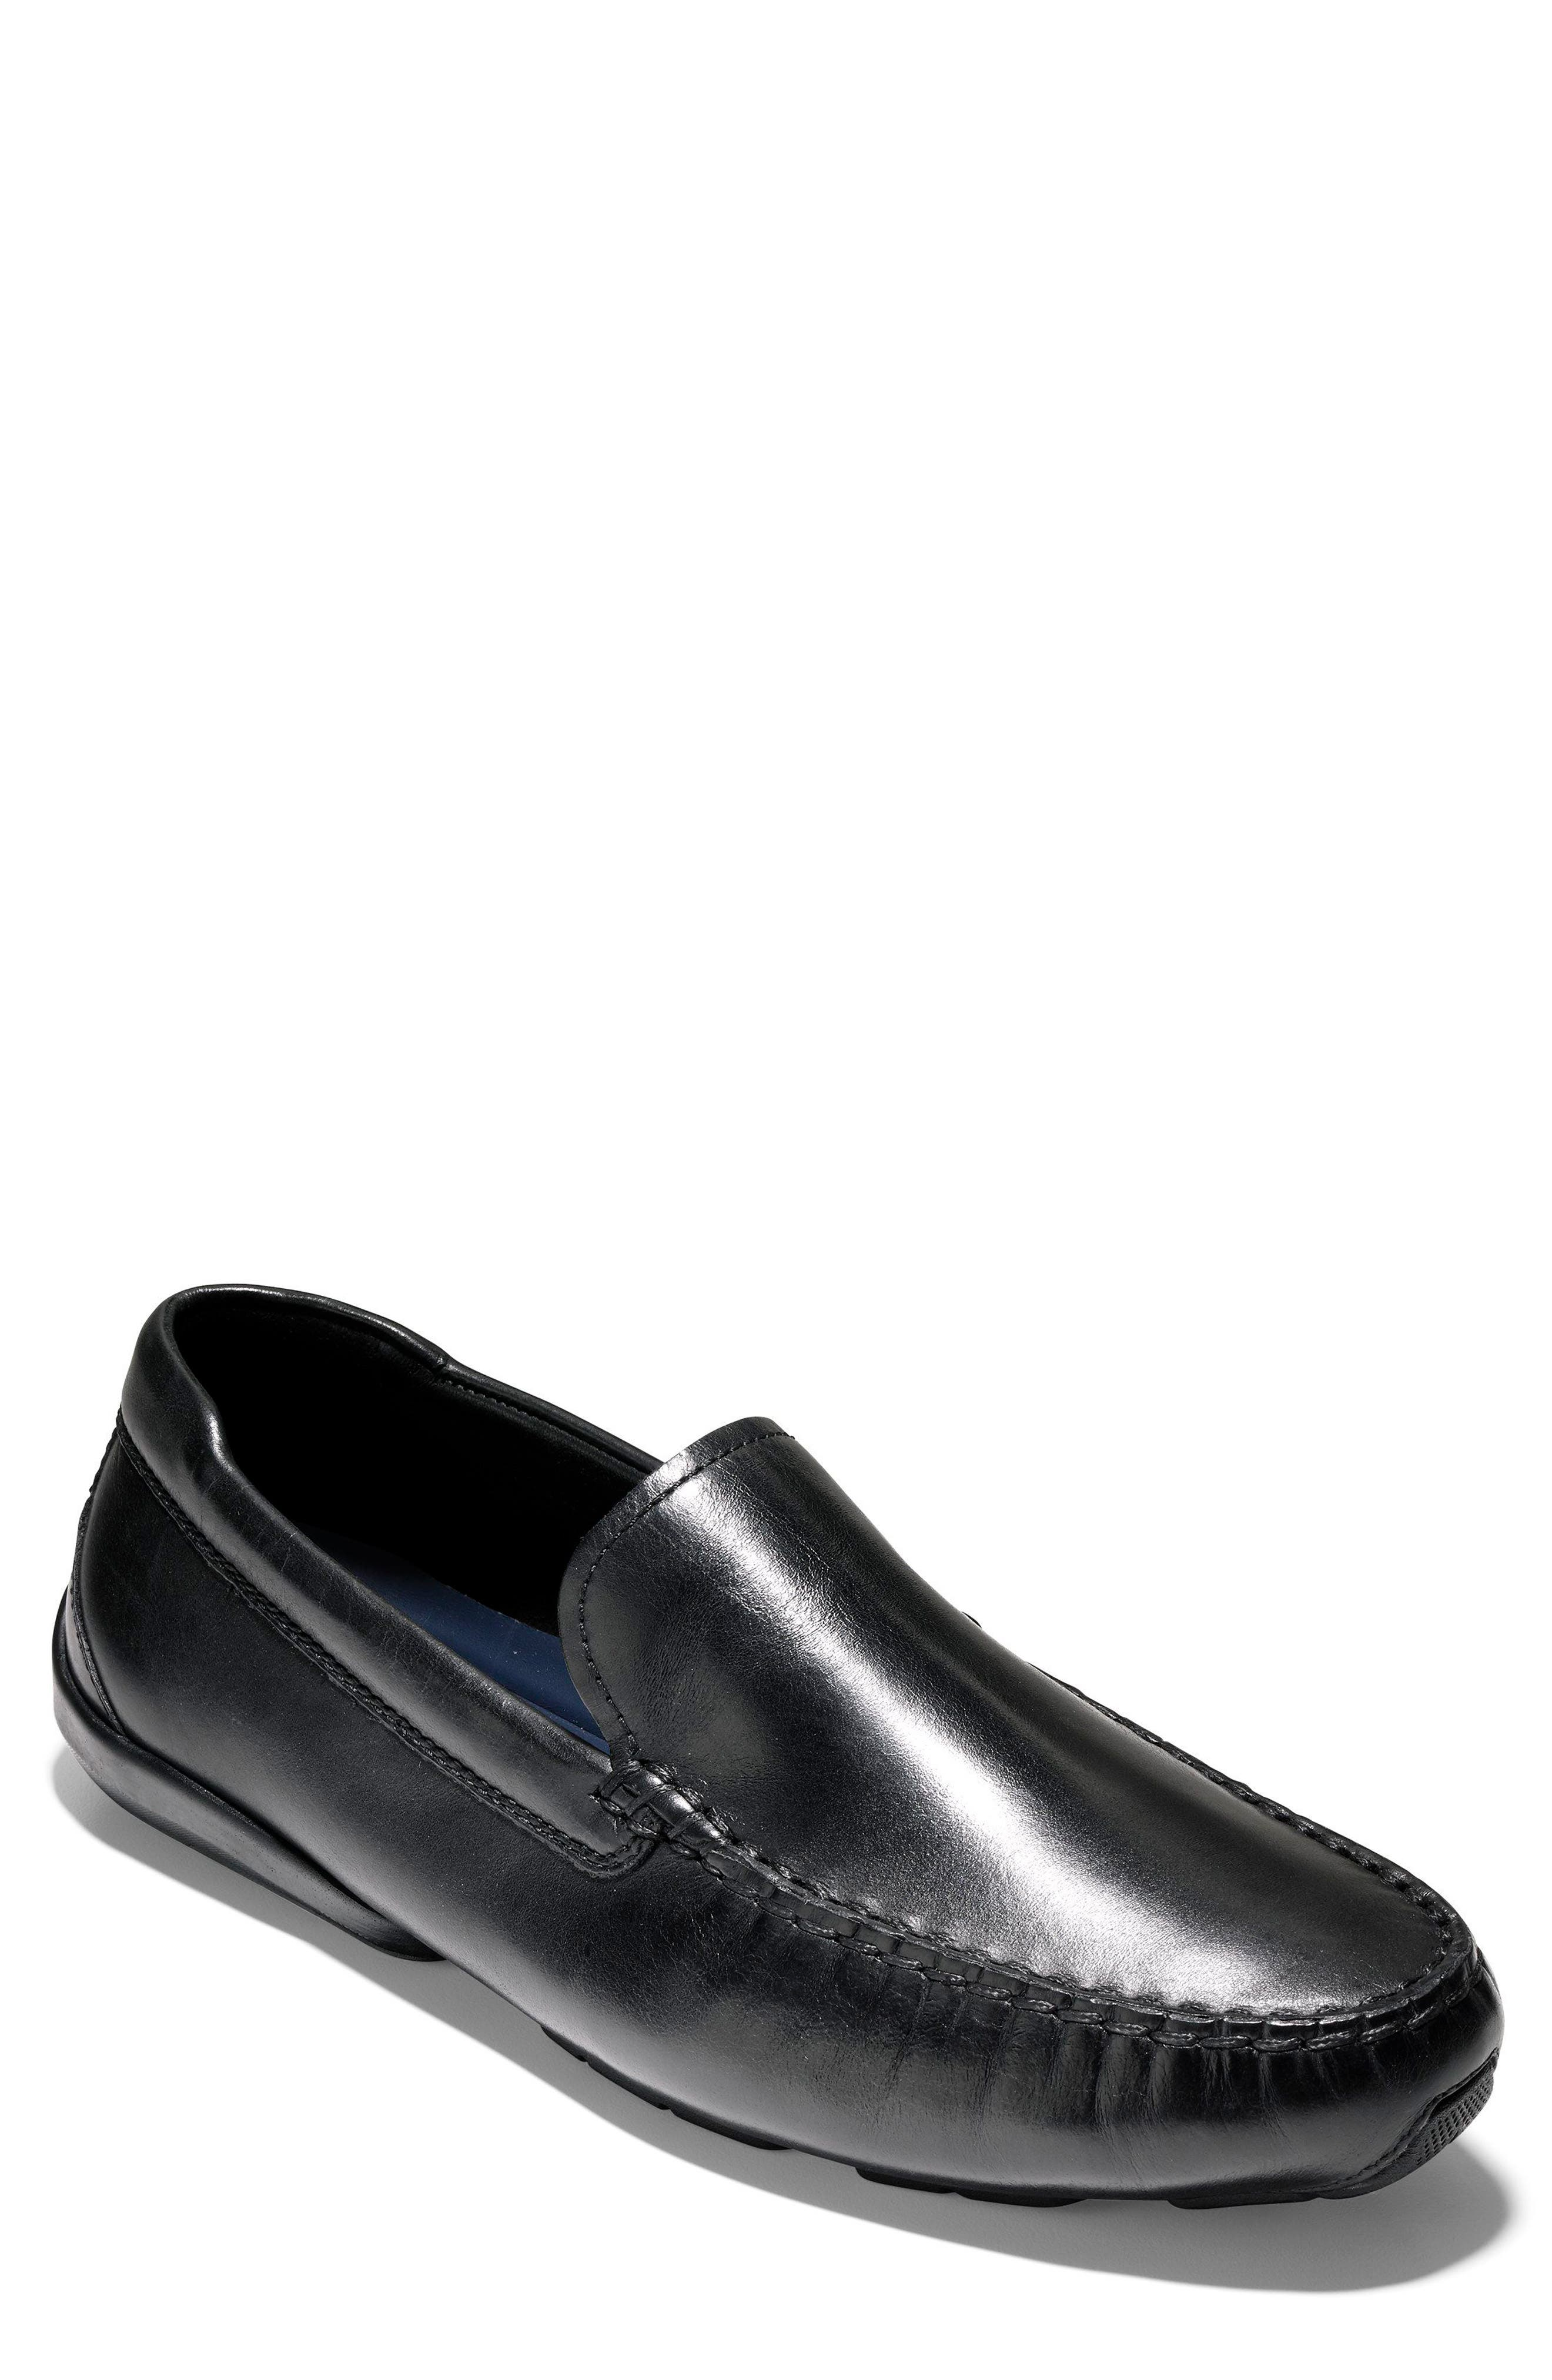 Branson Driving Shoe,                         Main,                         color, Black Leather